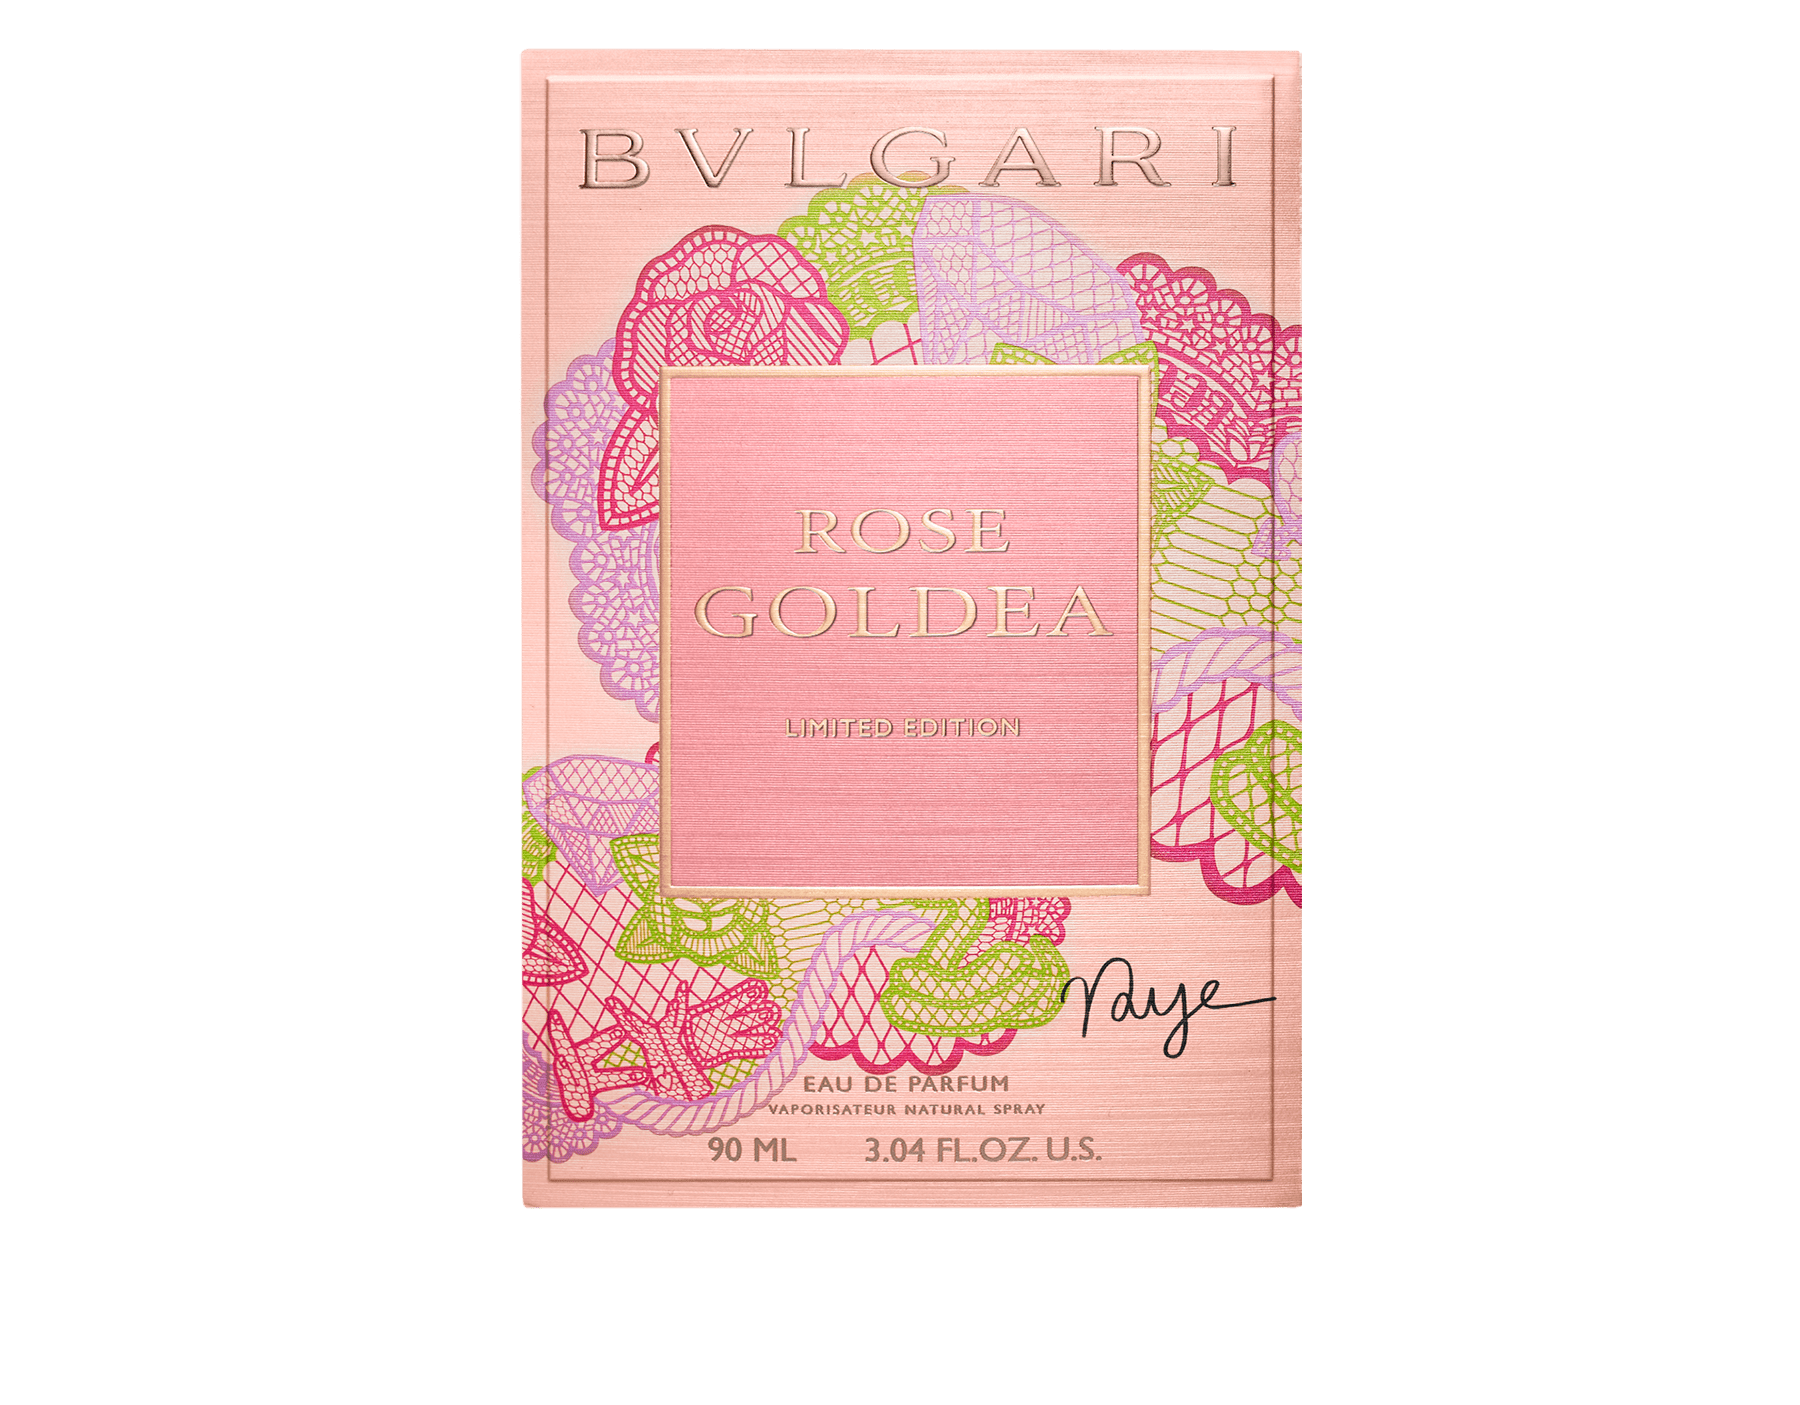 A new Limited Edition in collaboration with a Korean artist, Kathleen Kye, encapsulating the original Rose Goldea Eau de Parfum. 41150 image 5